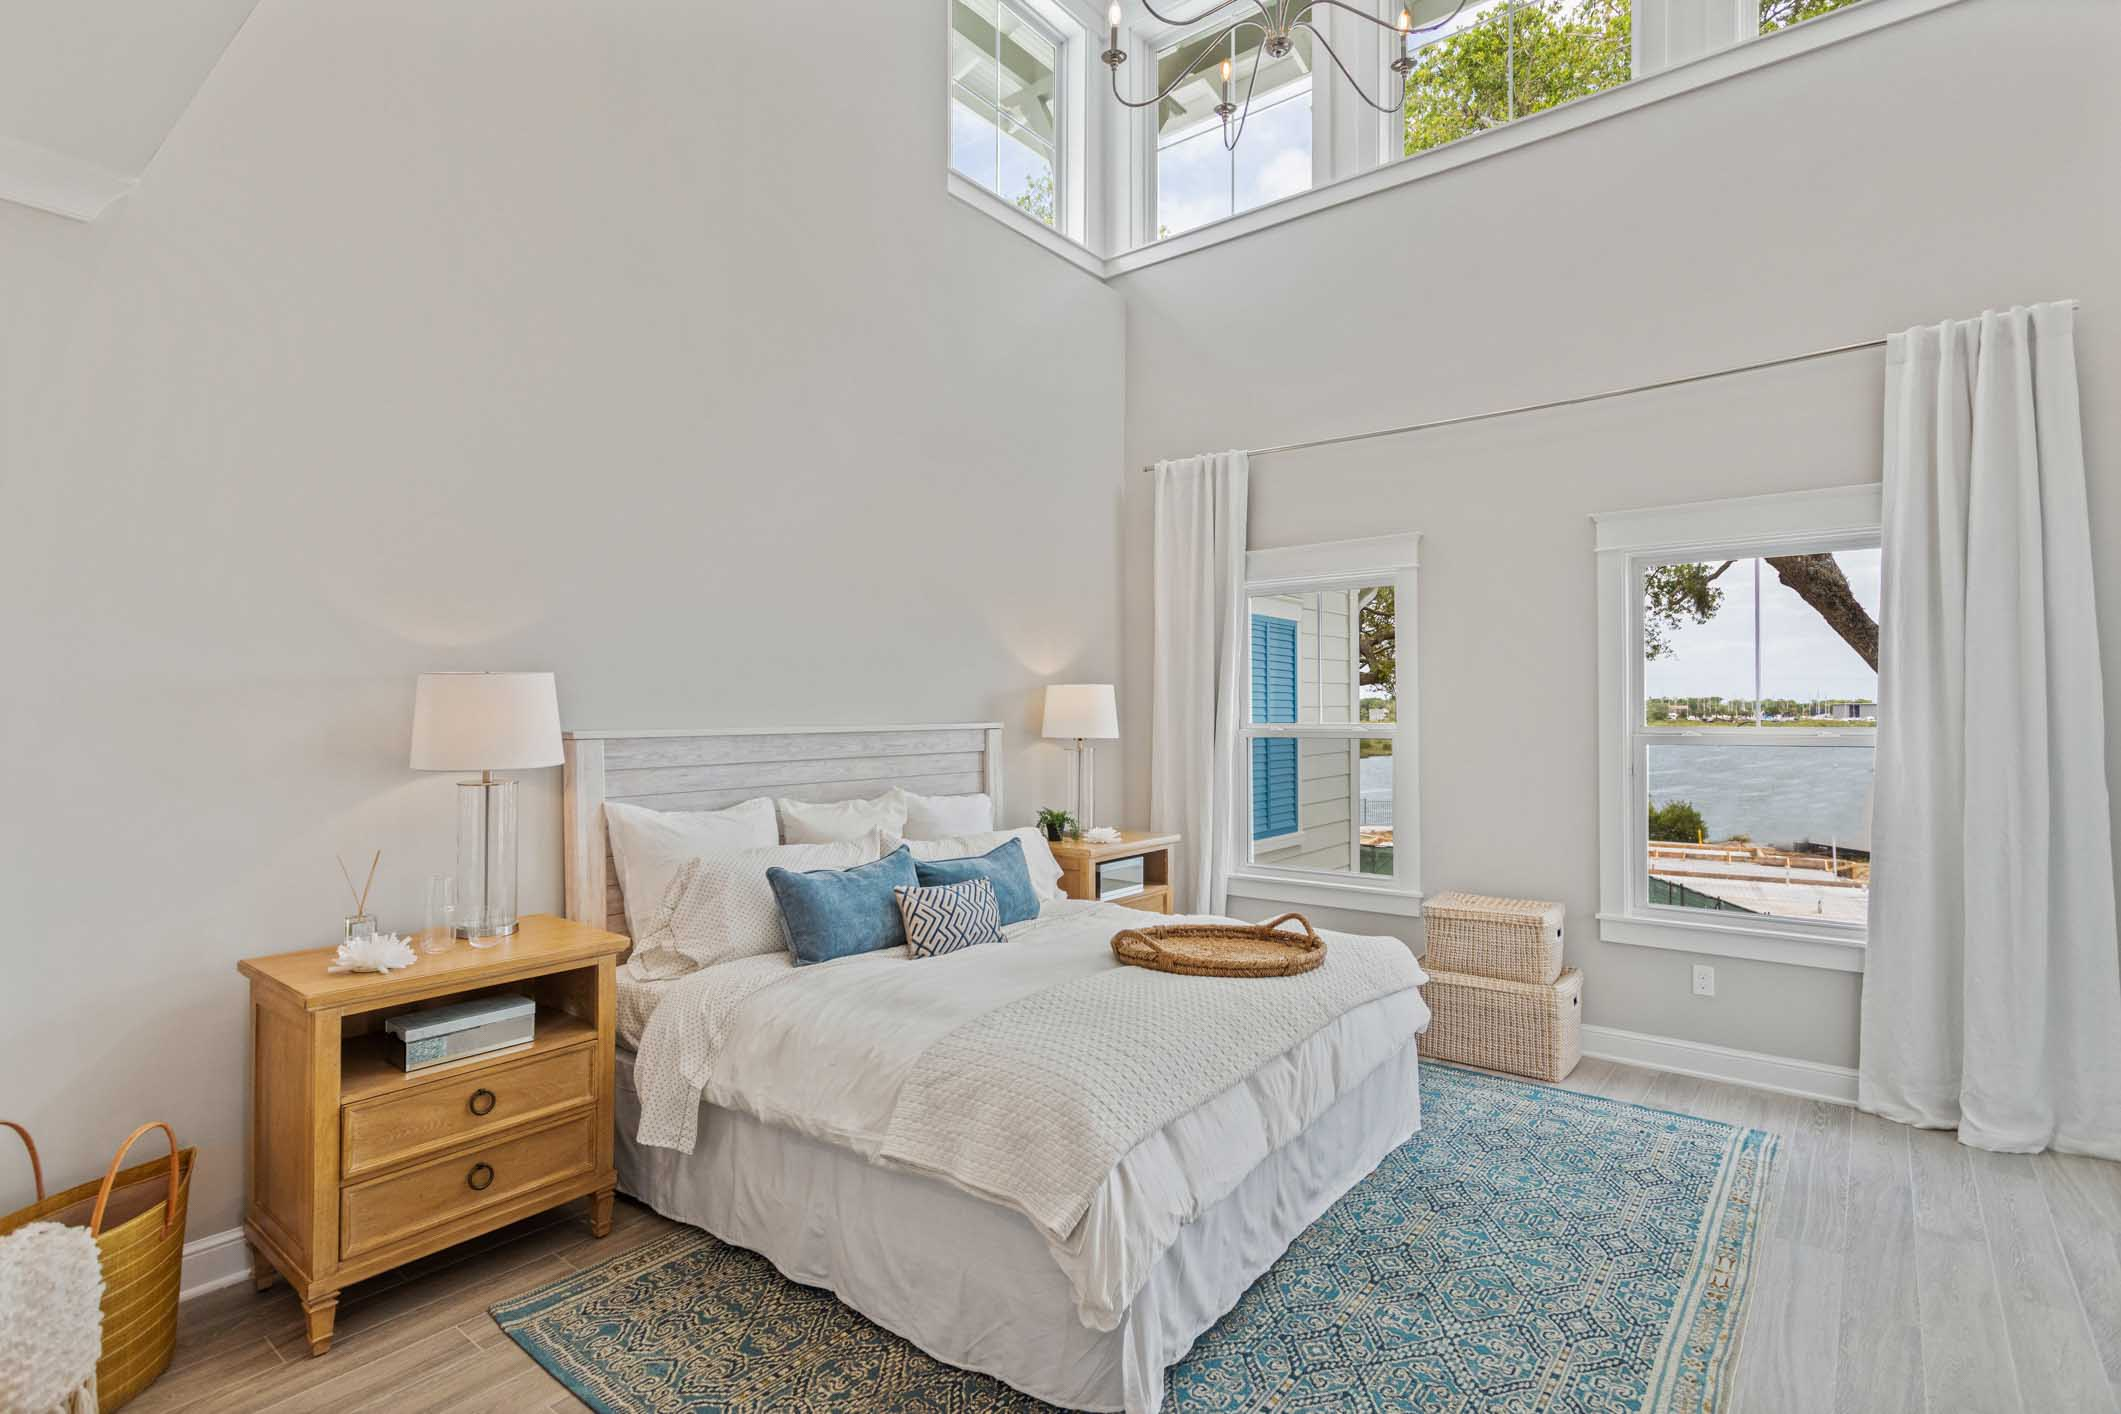 Interior view of master bedroom at VIlla Calissa